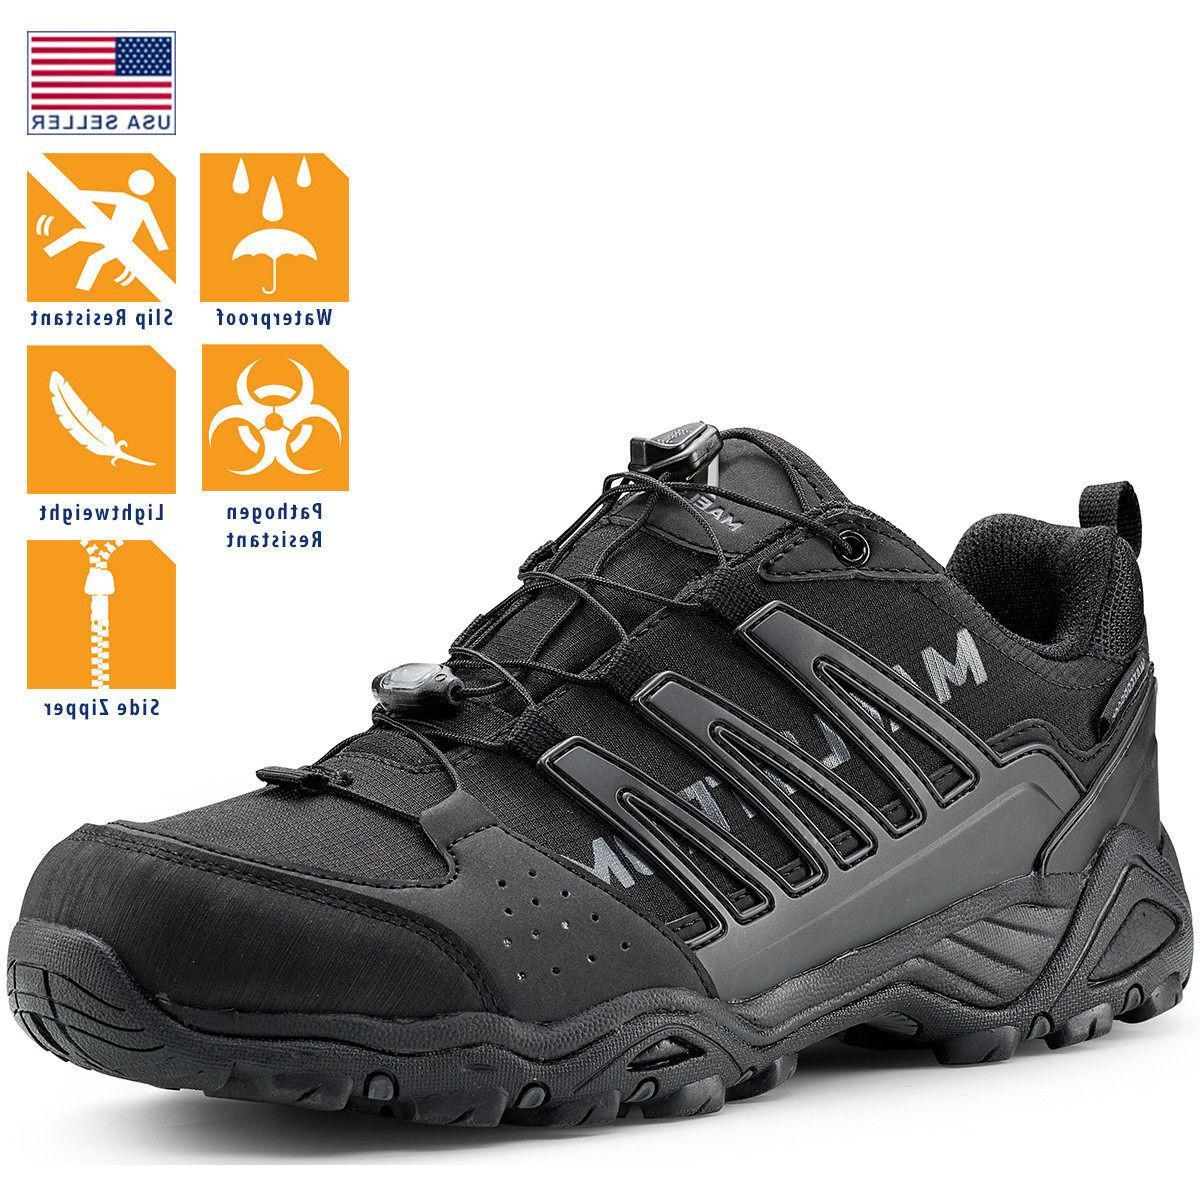 Maelstrom Waterproof Hiking Boots